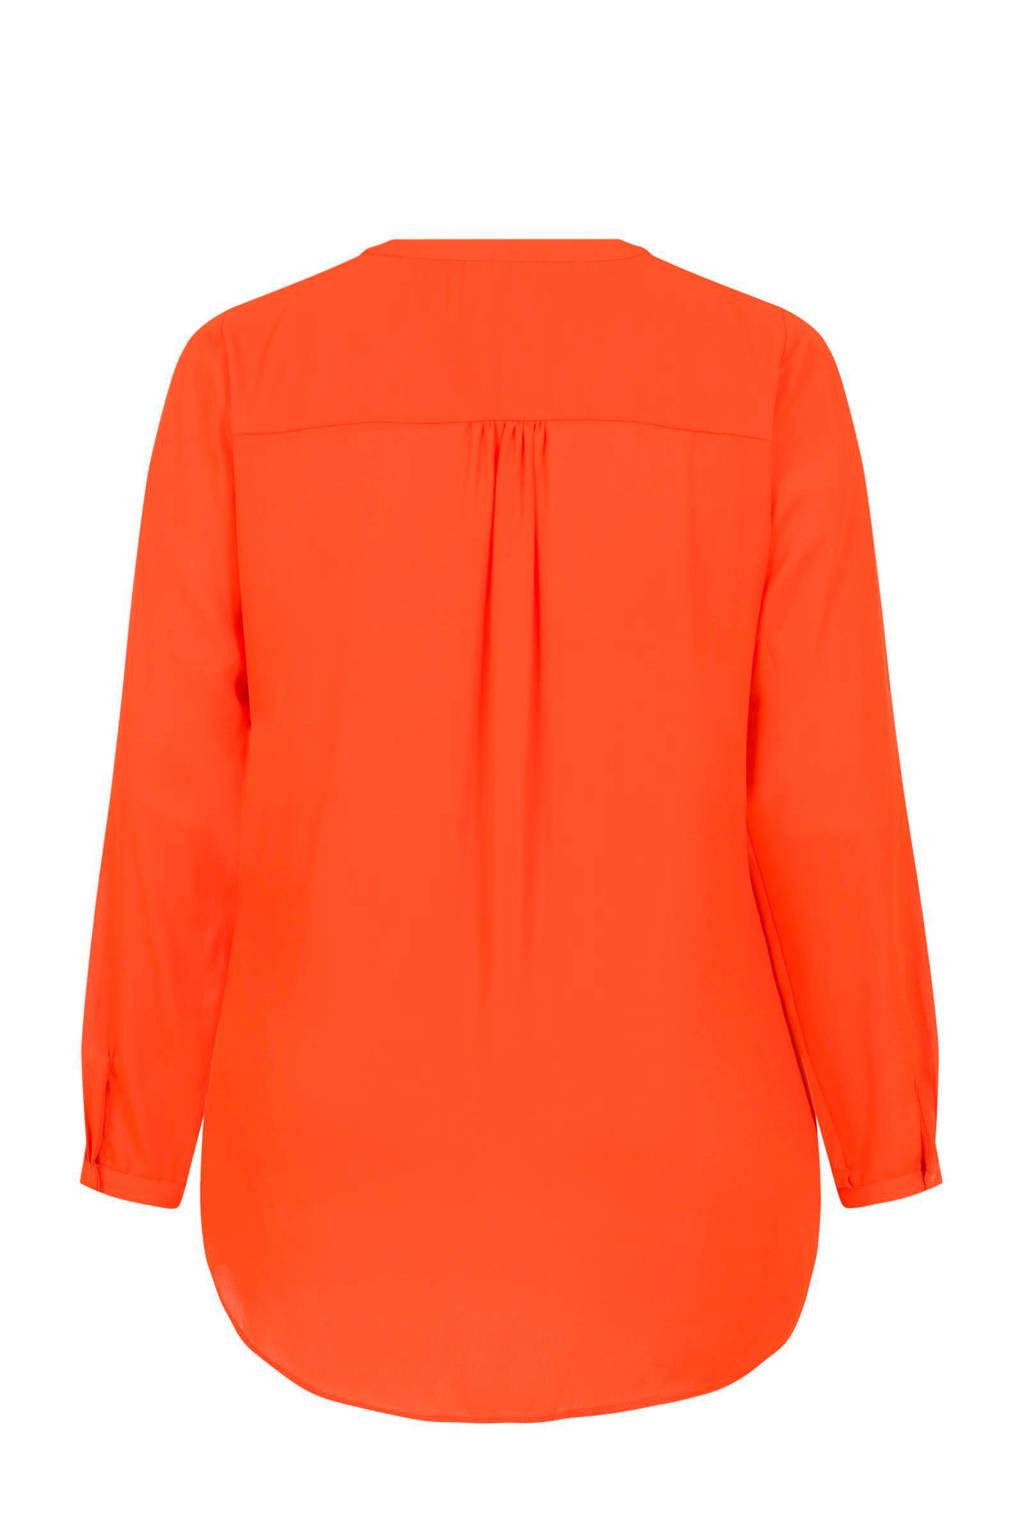 Miss Etam Plus blouse oranje, Oranje